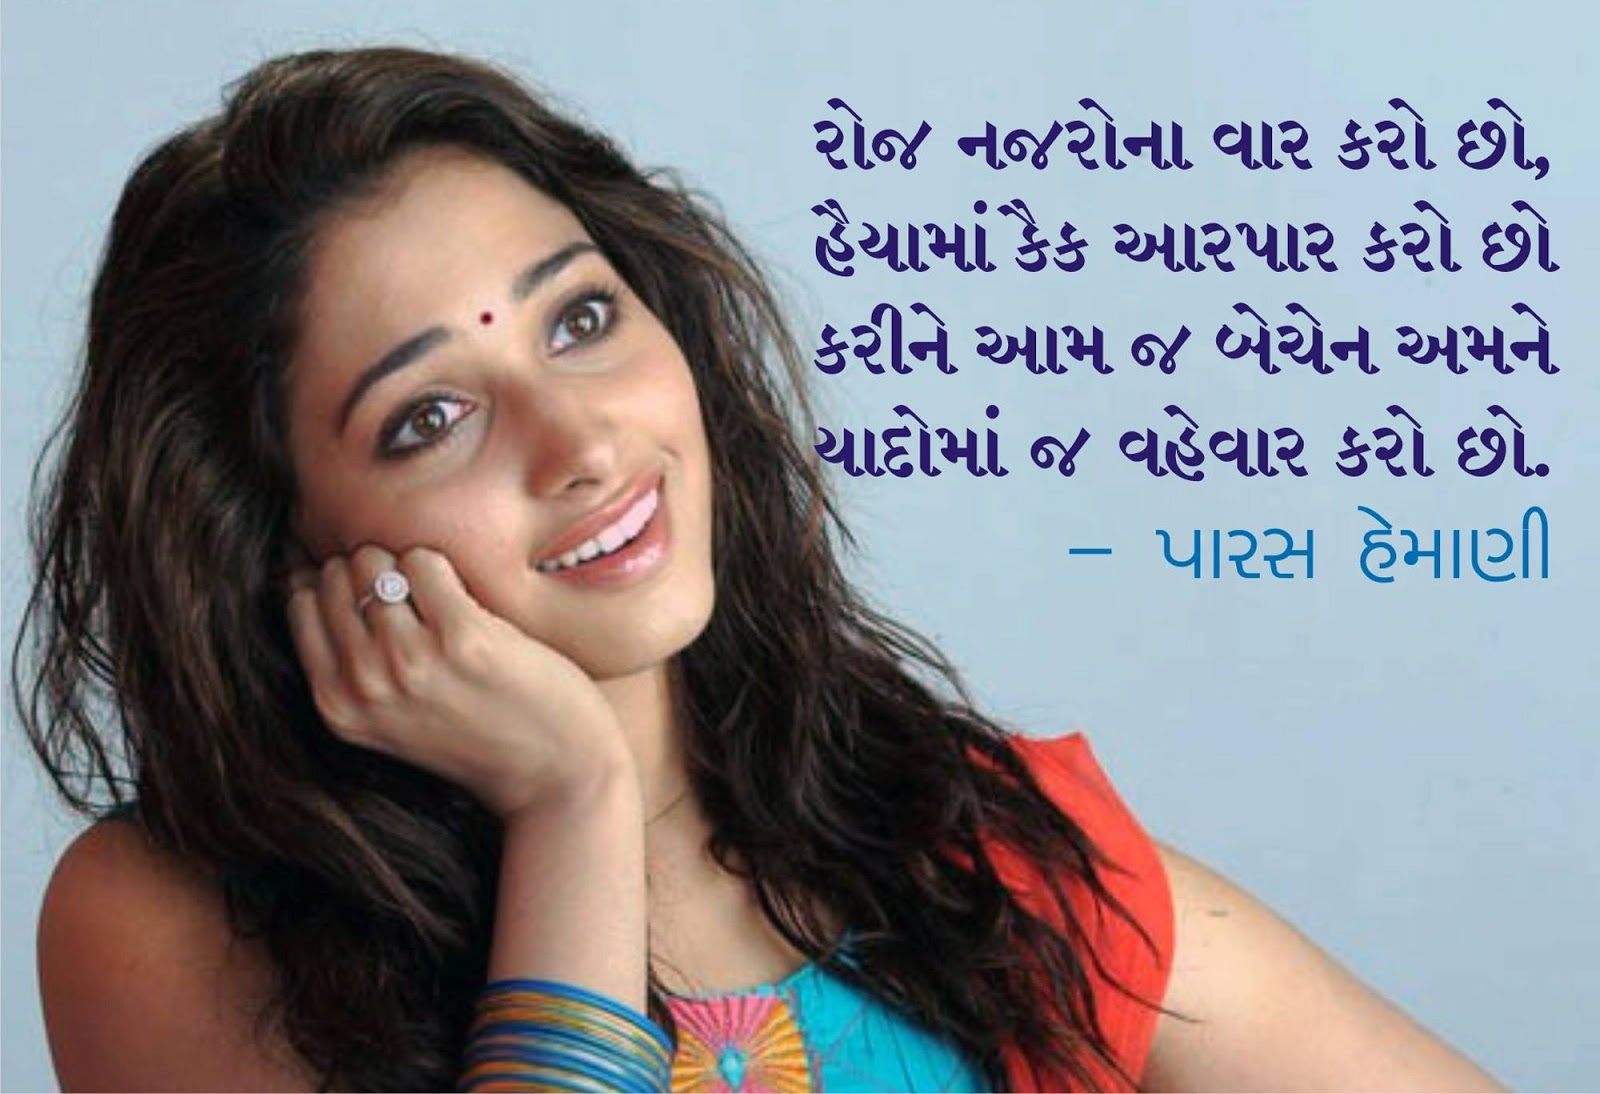 Hindi Shayari,Love Shayari, Romantic Shayari, Sad Shayari And Love ...